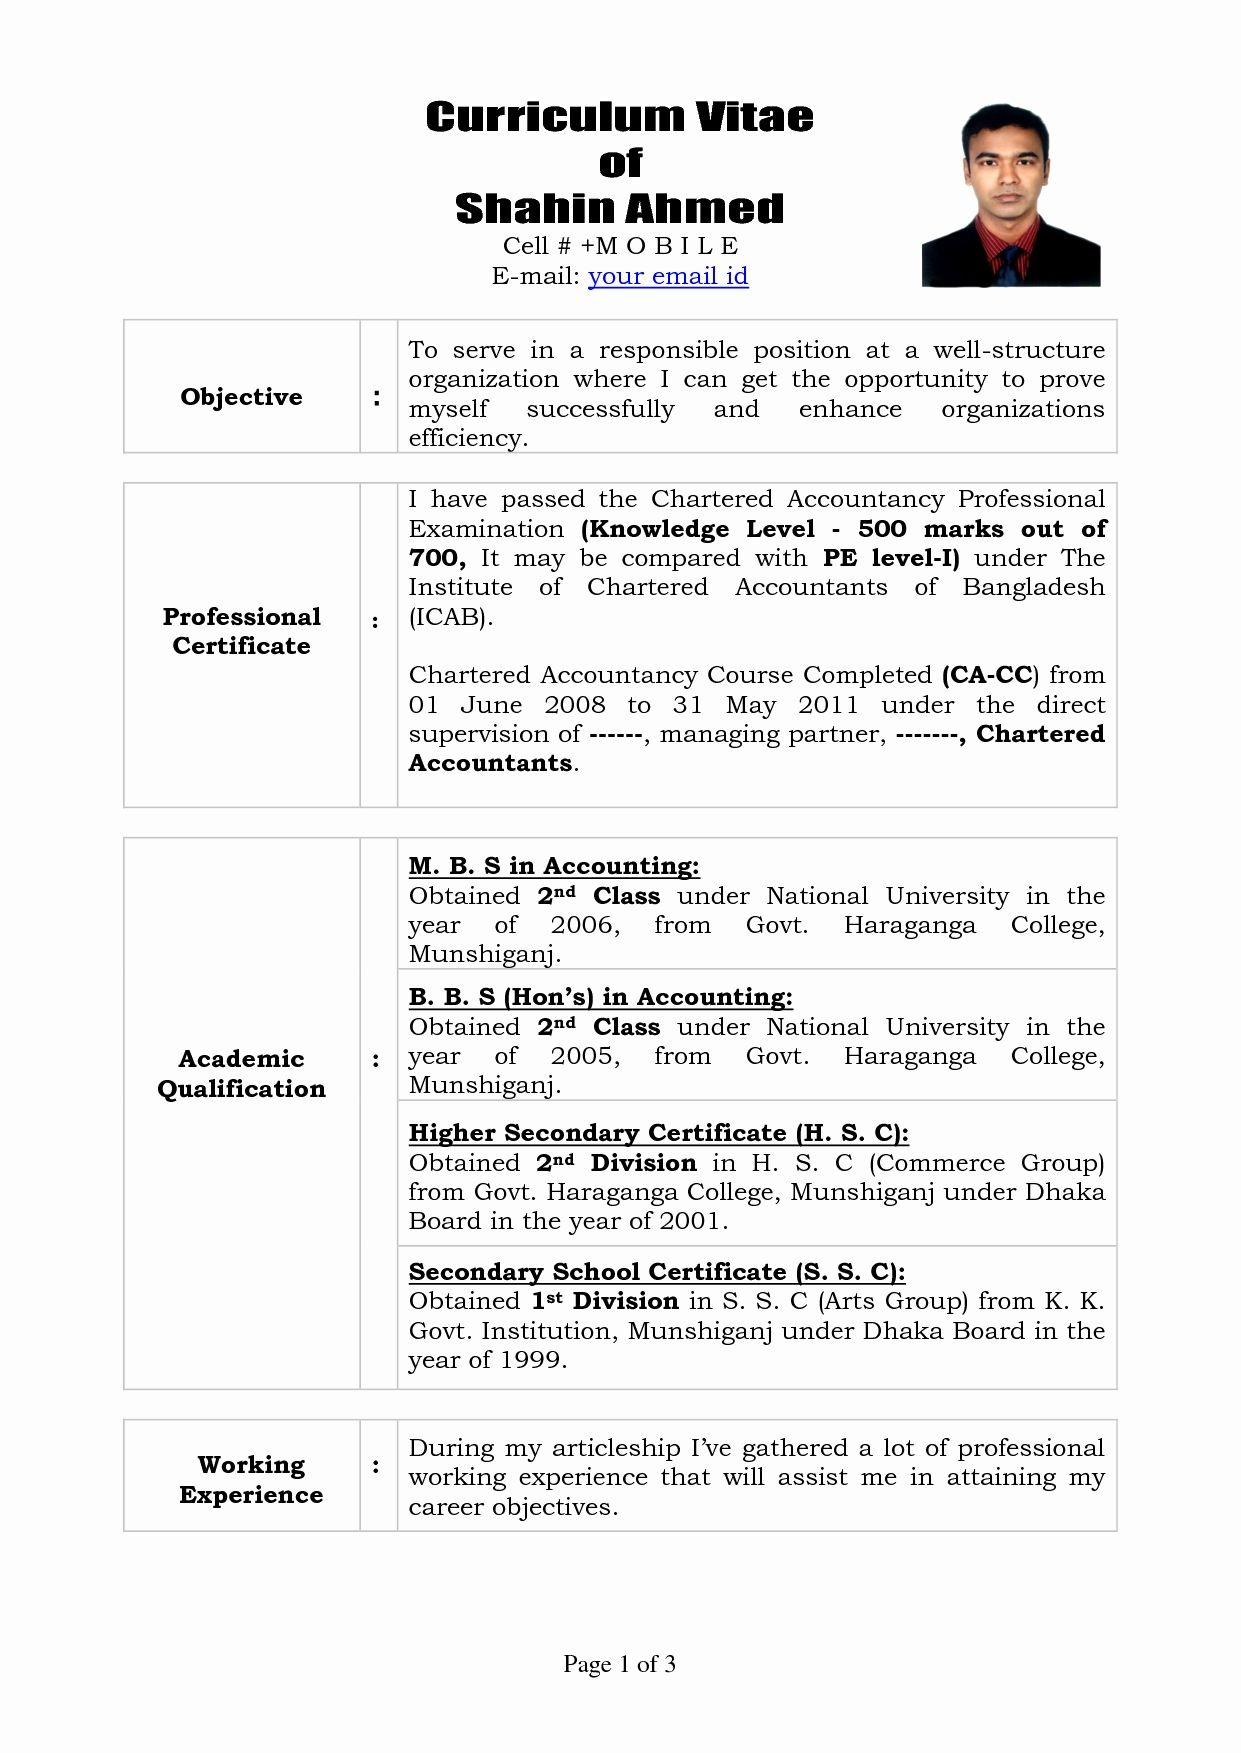 jane39s revised resume Resume examples, Student resume